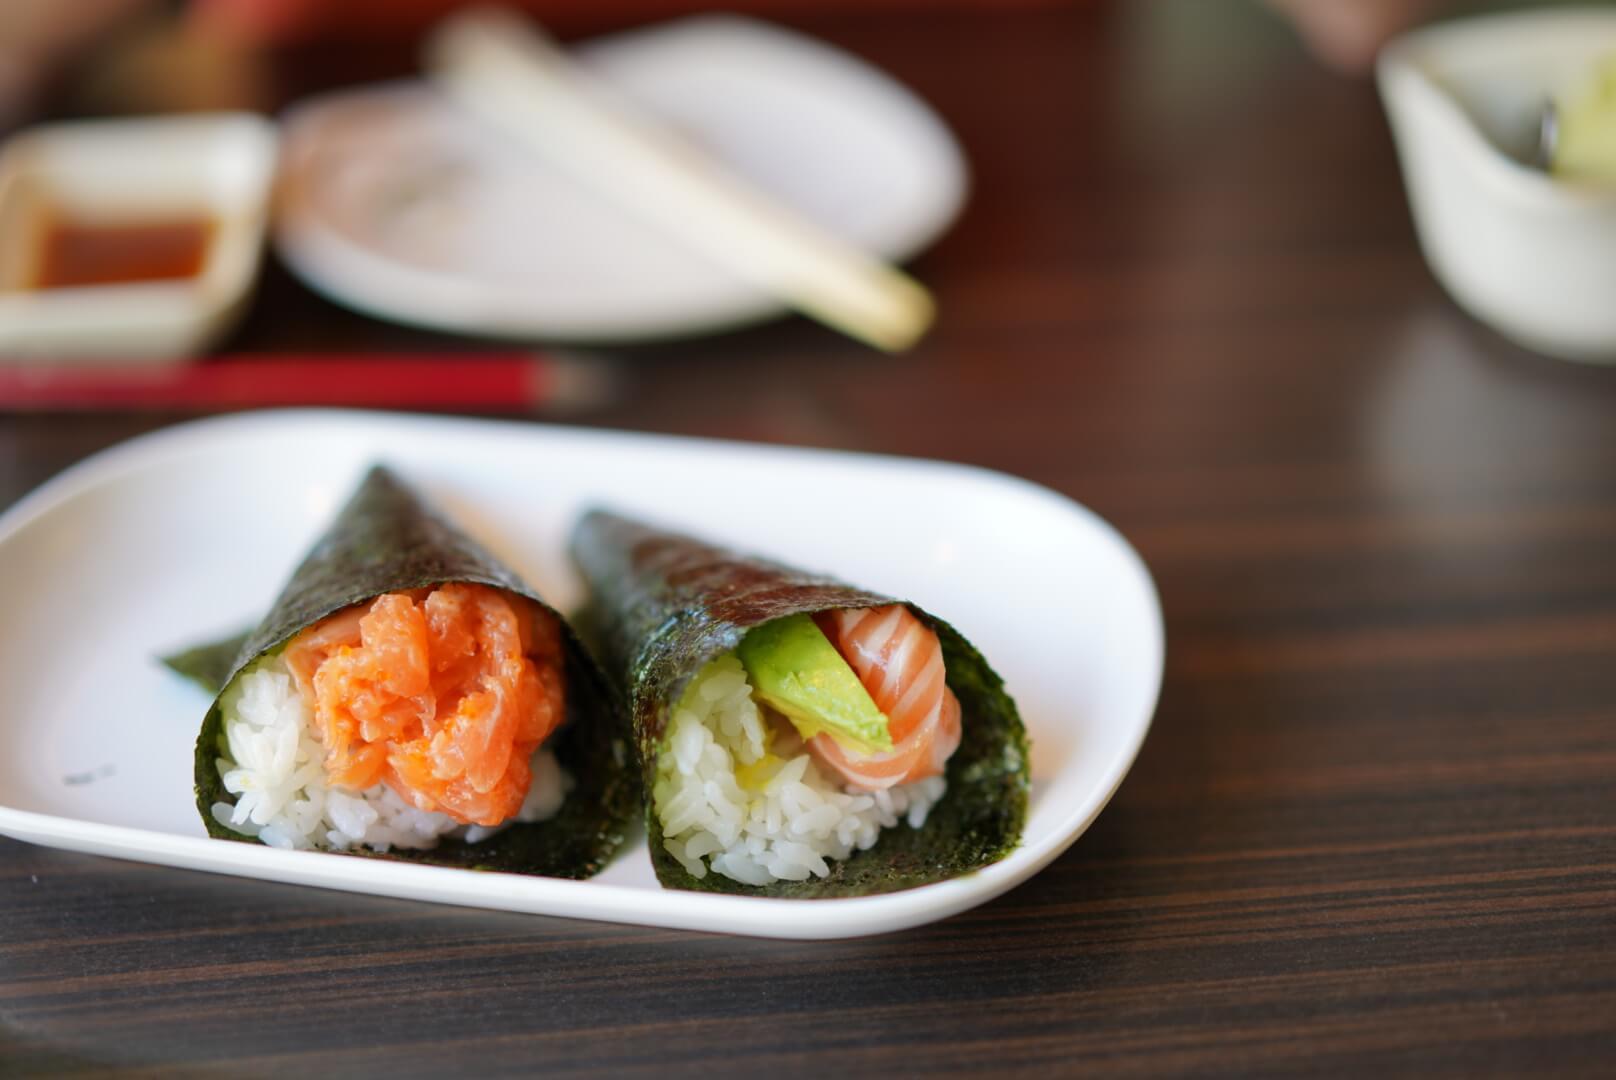 kyoto house sushiのスパイシーサーモン